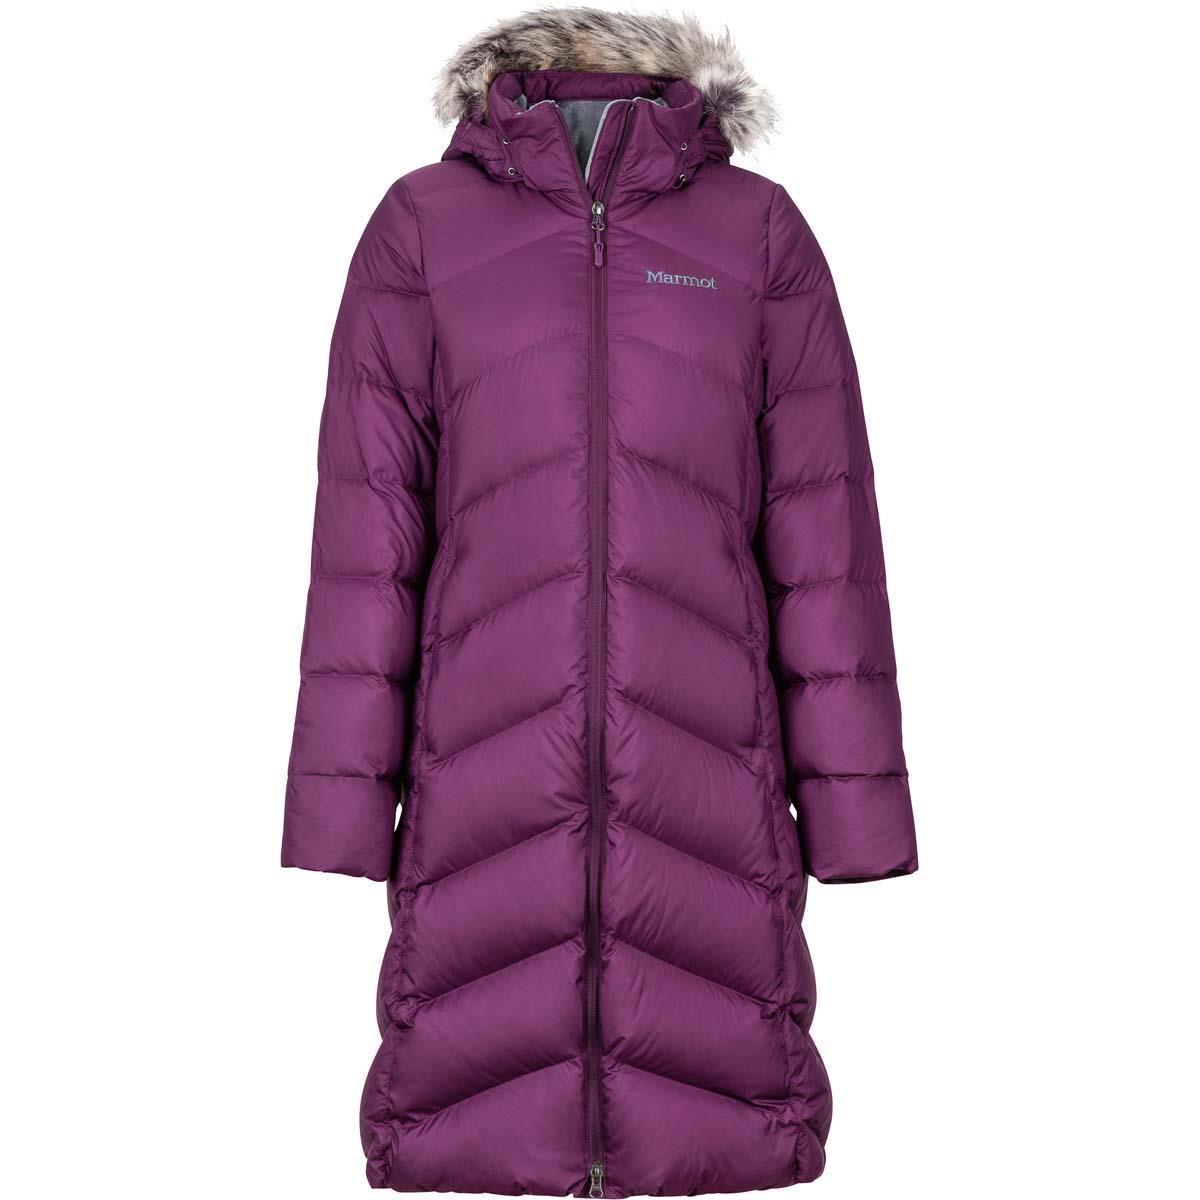 Marmot Montreaux Coat Womens. Loading zoom 44a4a5a39f30